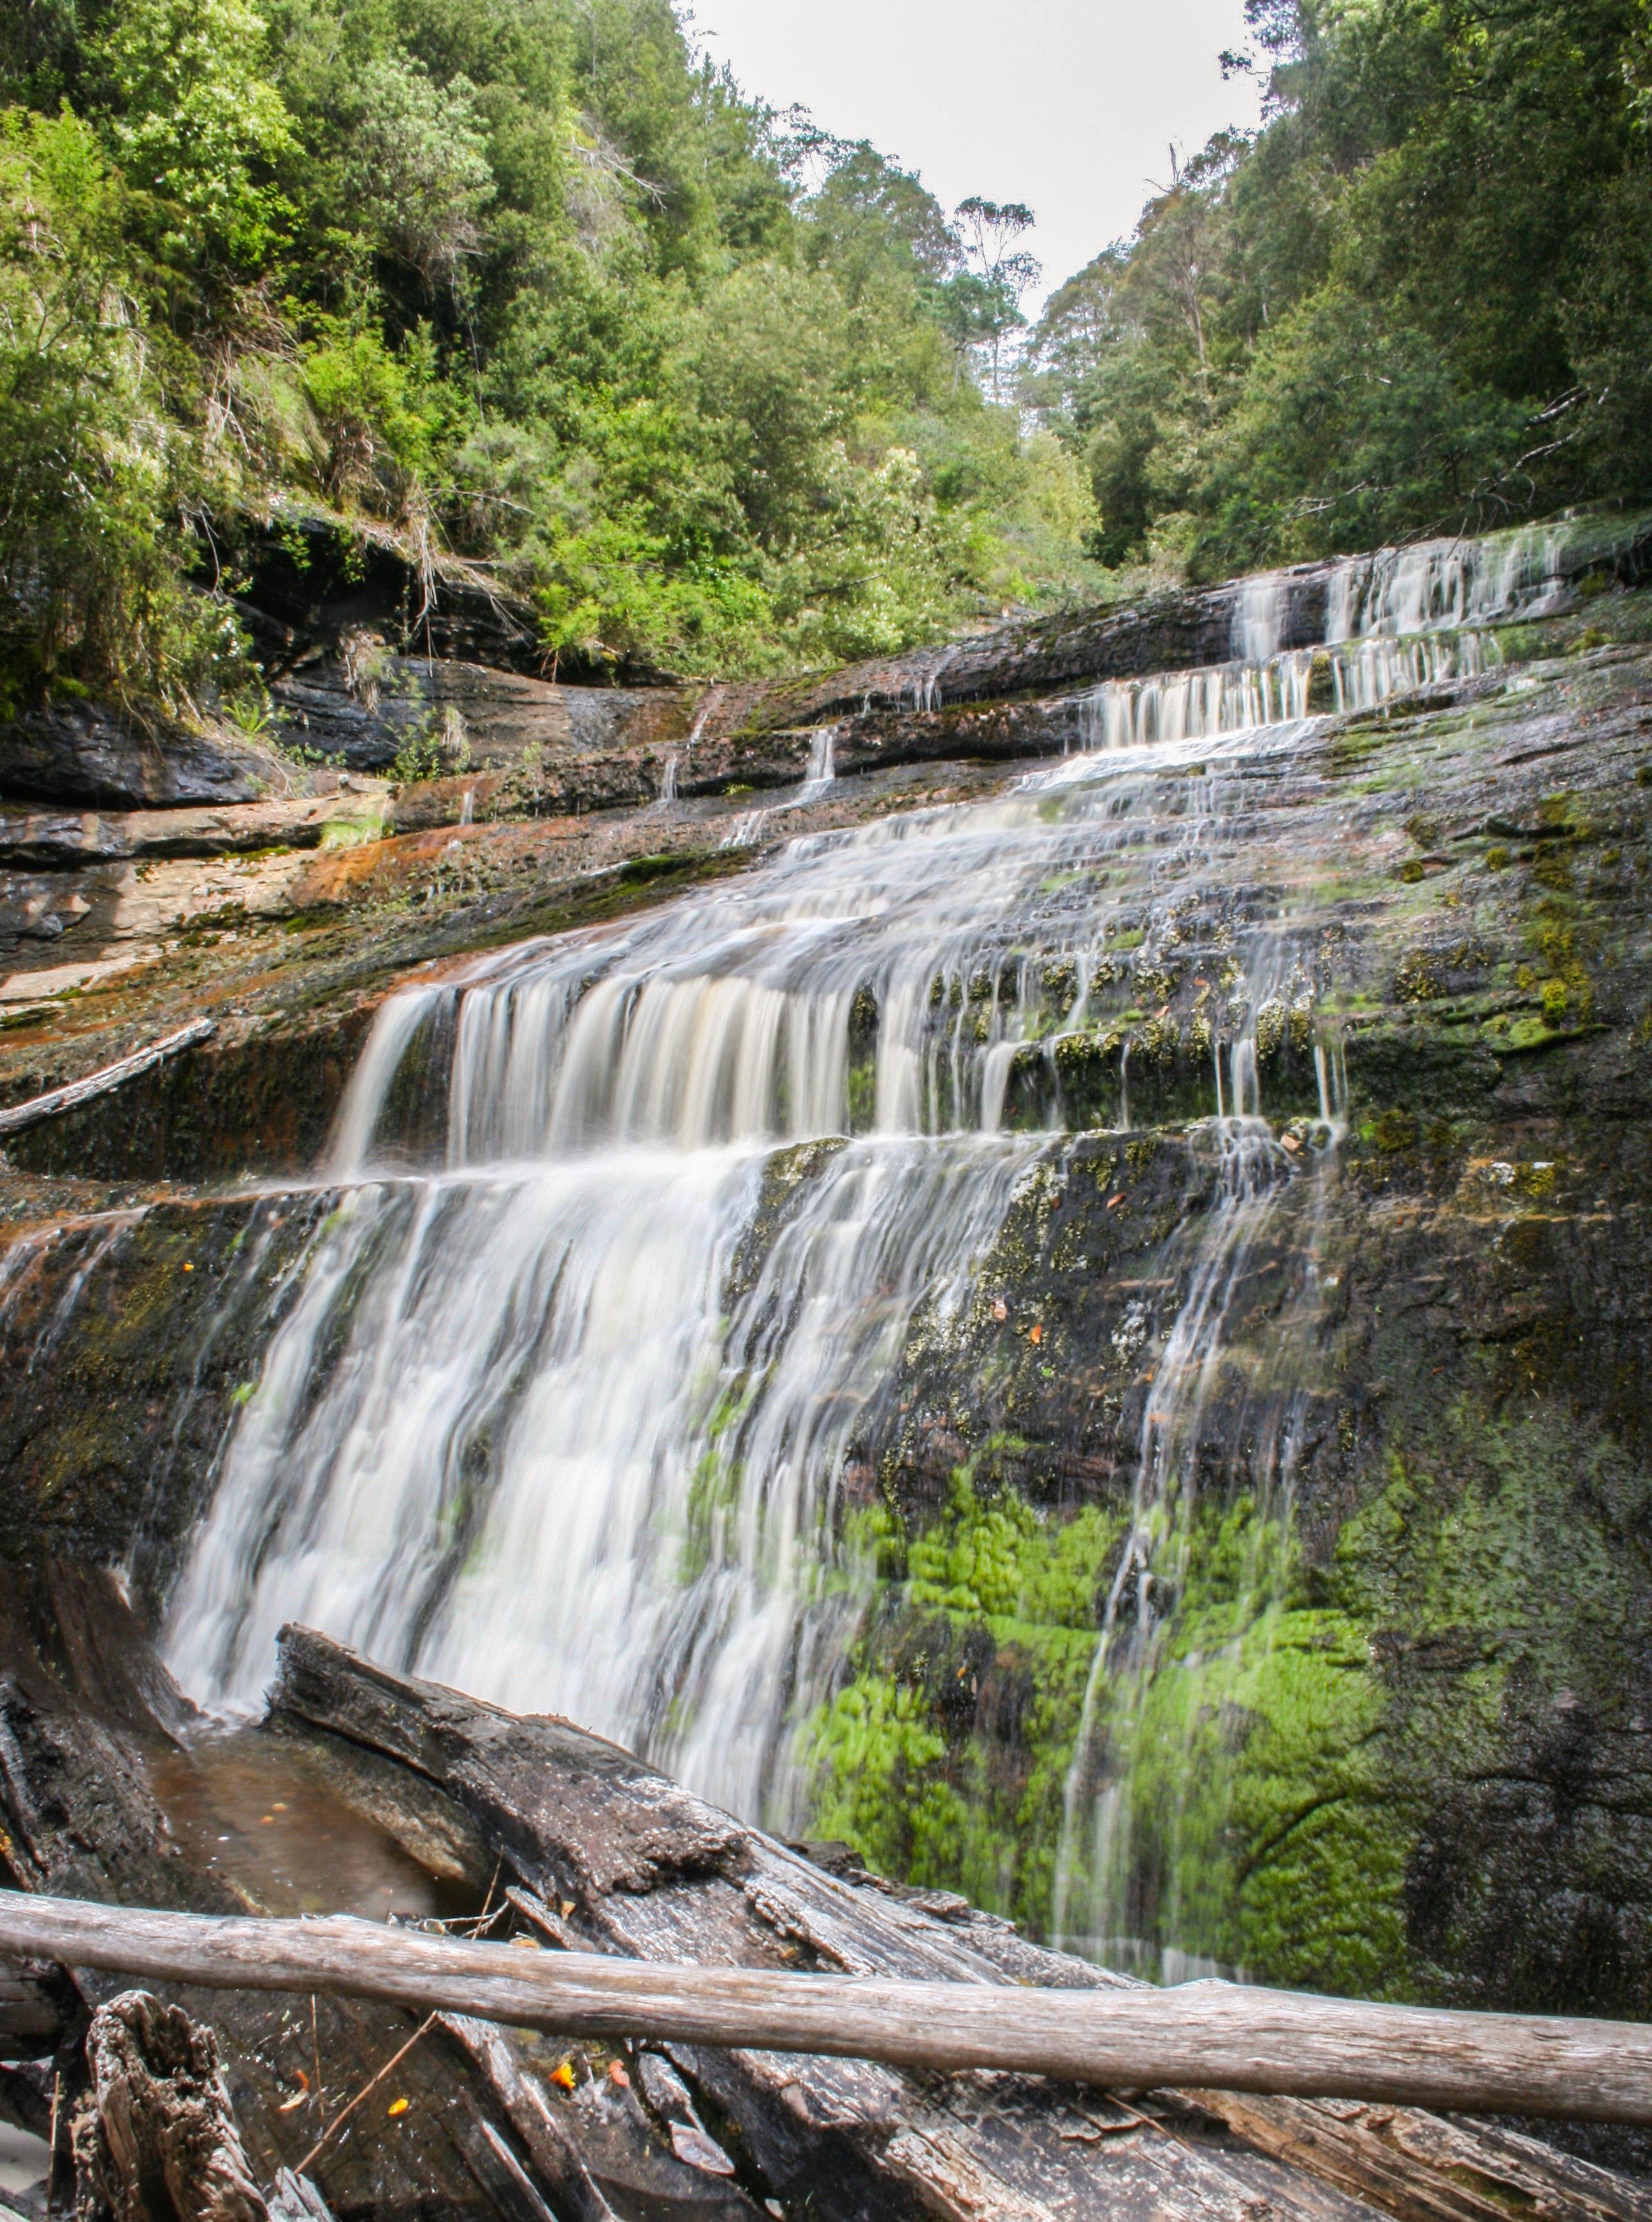 Cataract Falls (upper section)